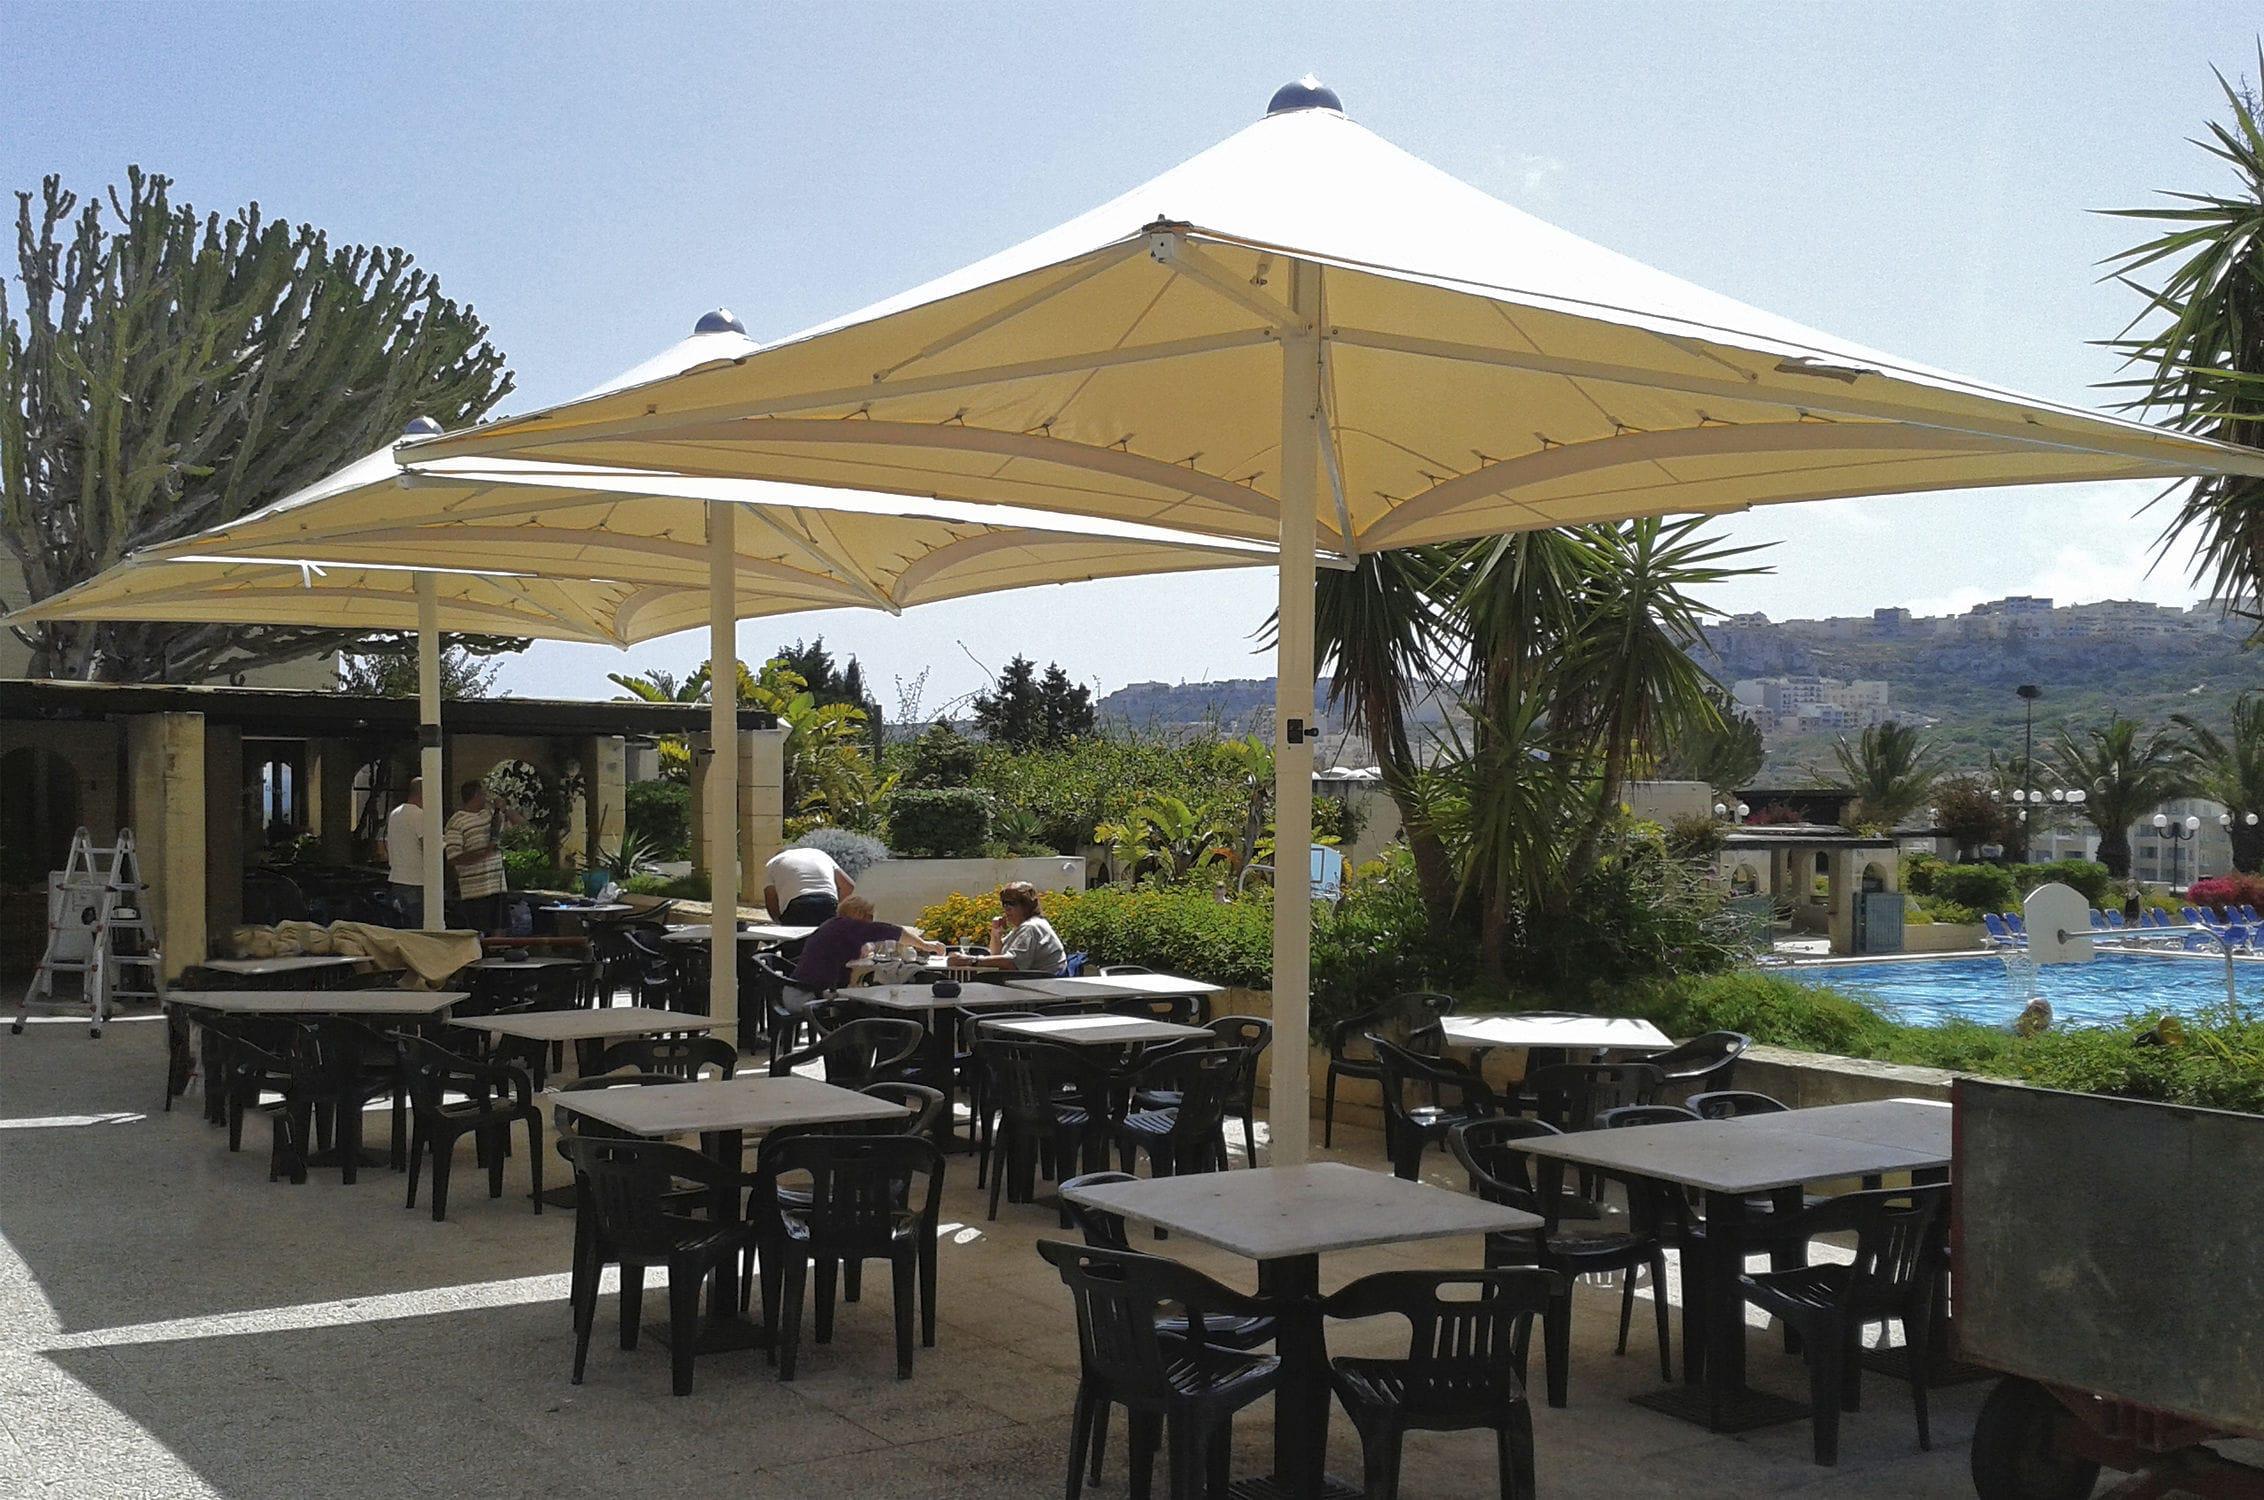 Bar Patio Umbrella For Hotels For Restaurants For Public Pools